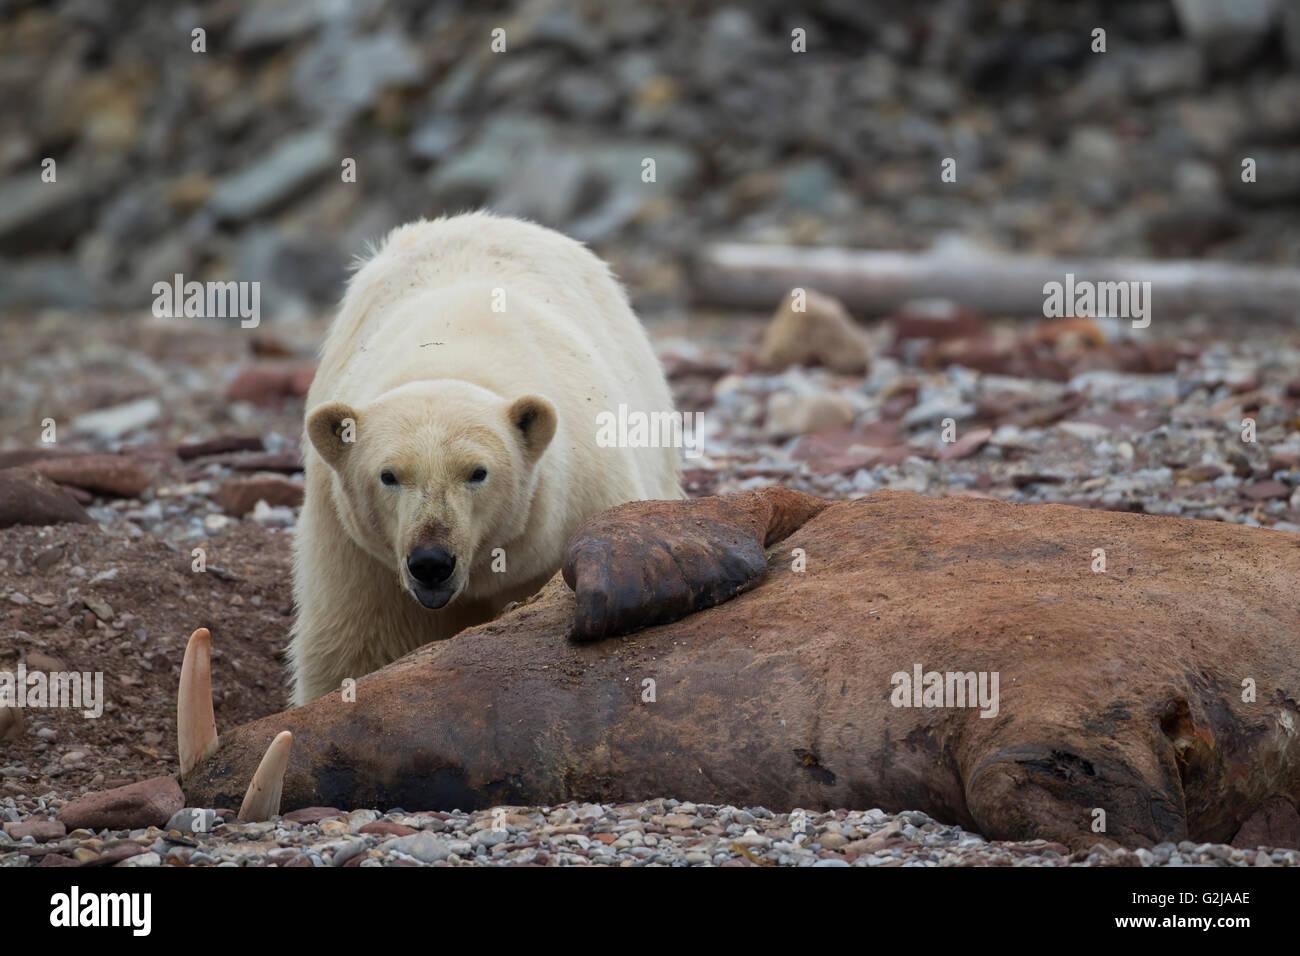 Polar bear, Ursus maritimus, Eats a walrus, Svalbard, Norway - Stock Image